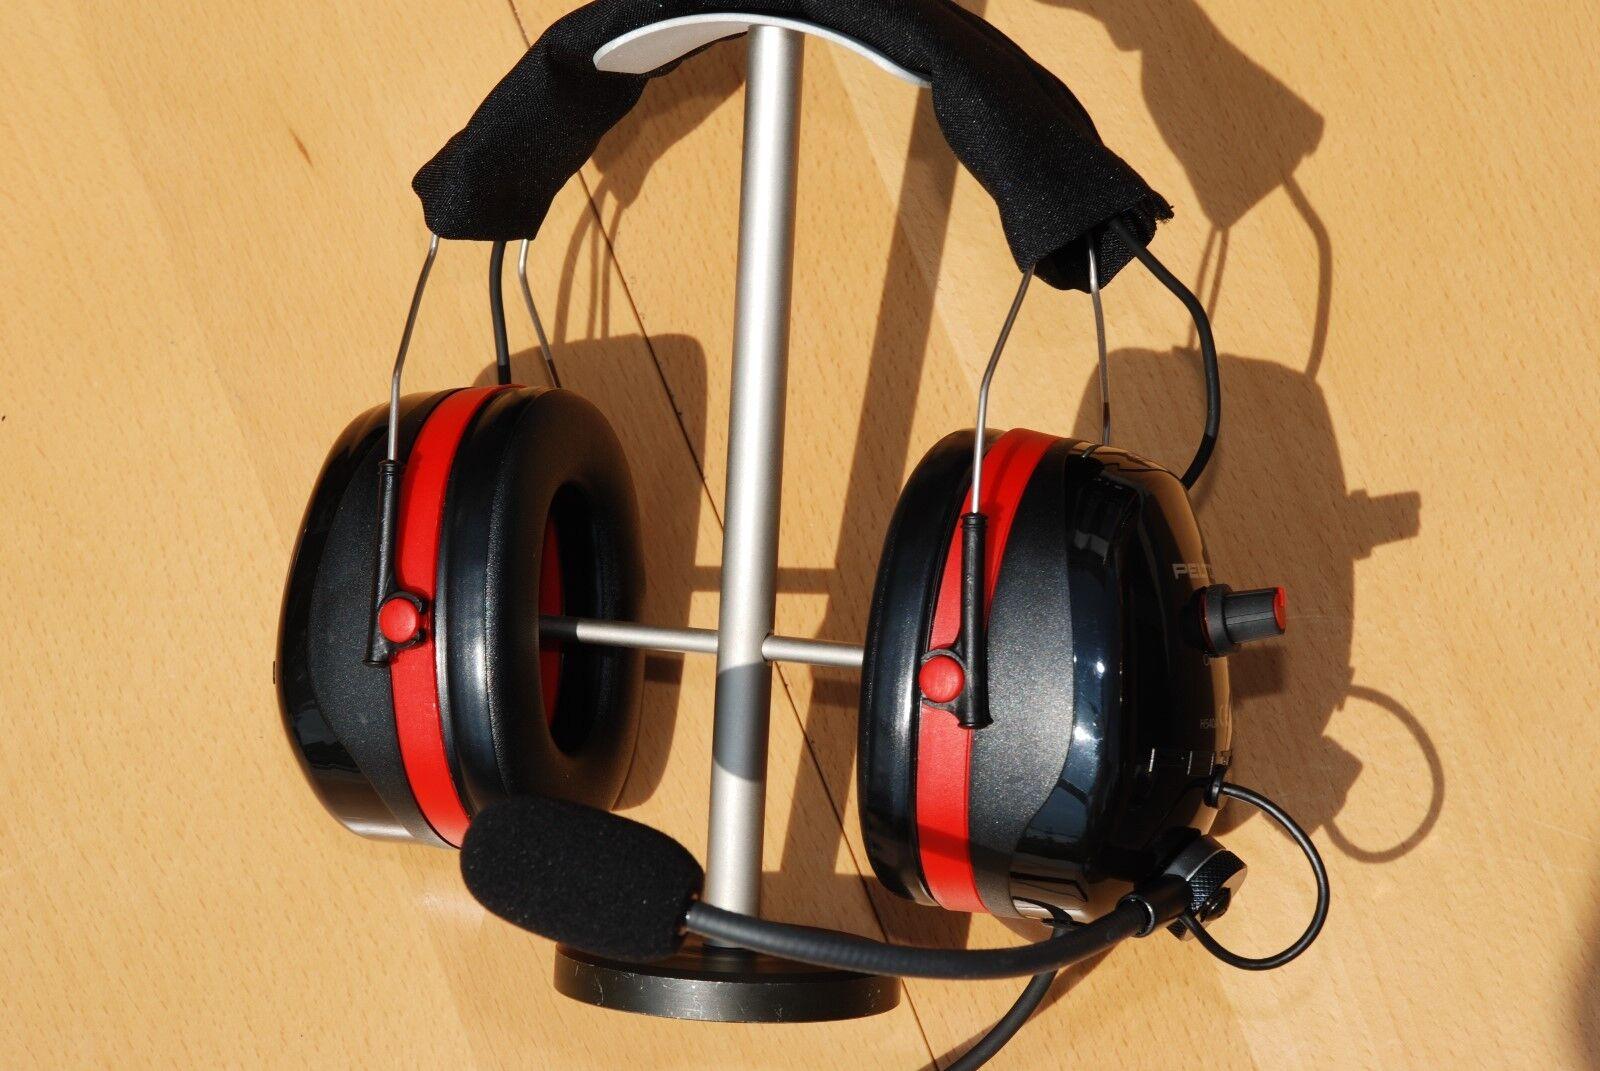 Piloten Headset für TELCOM ANR Intercomanlagen  Vector Vector  0UL NEU  -31dB TOP c0cca3